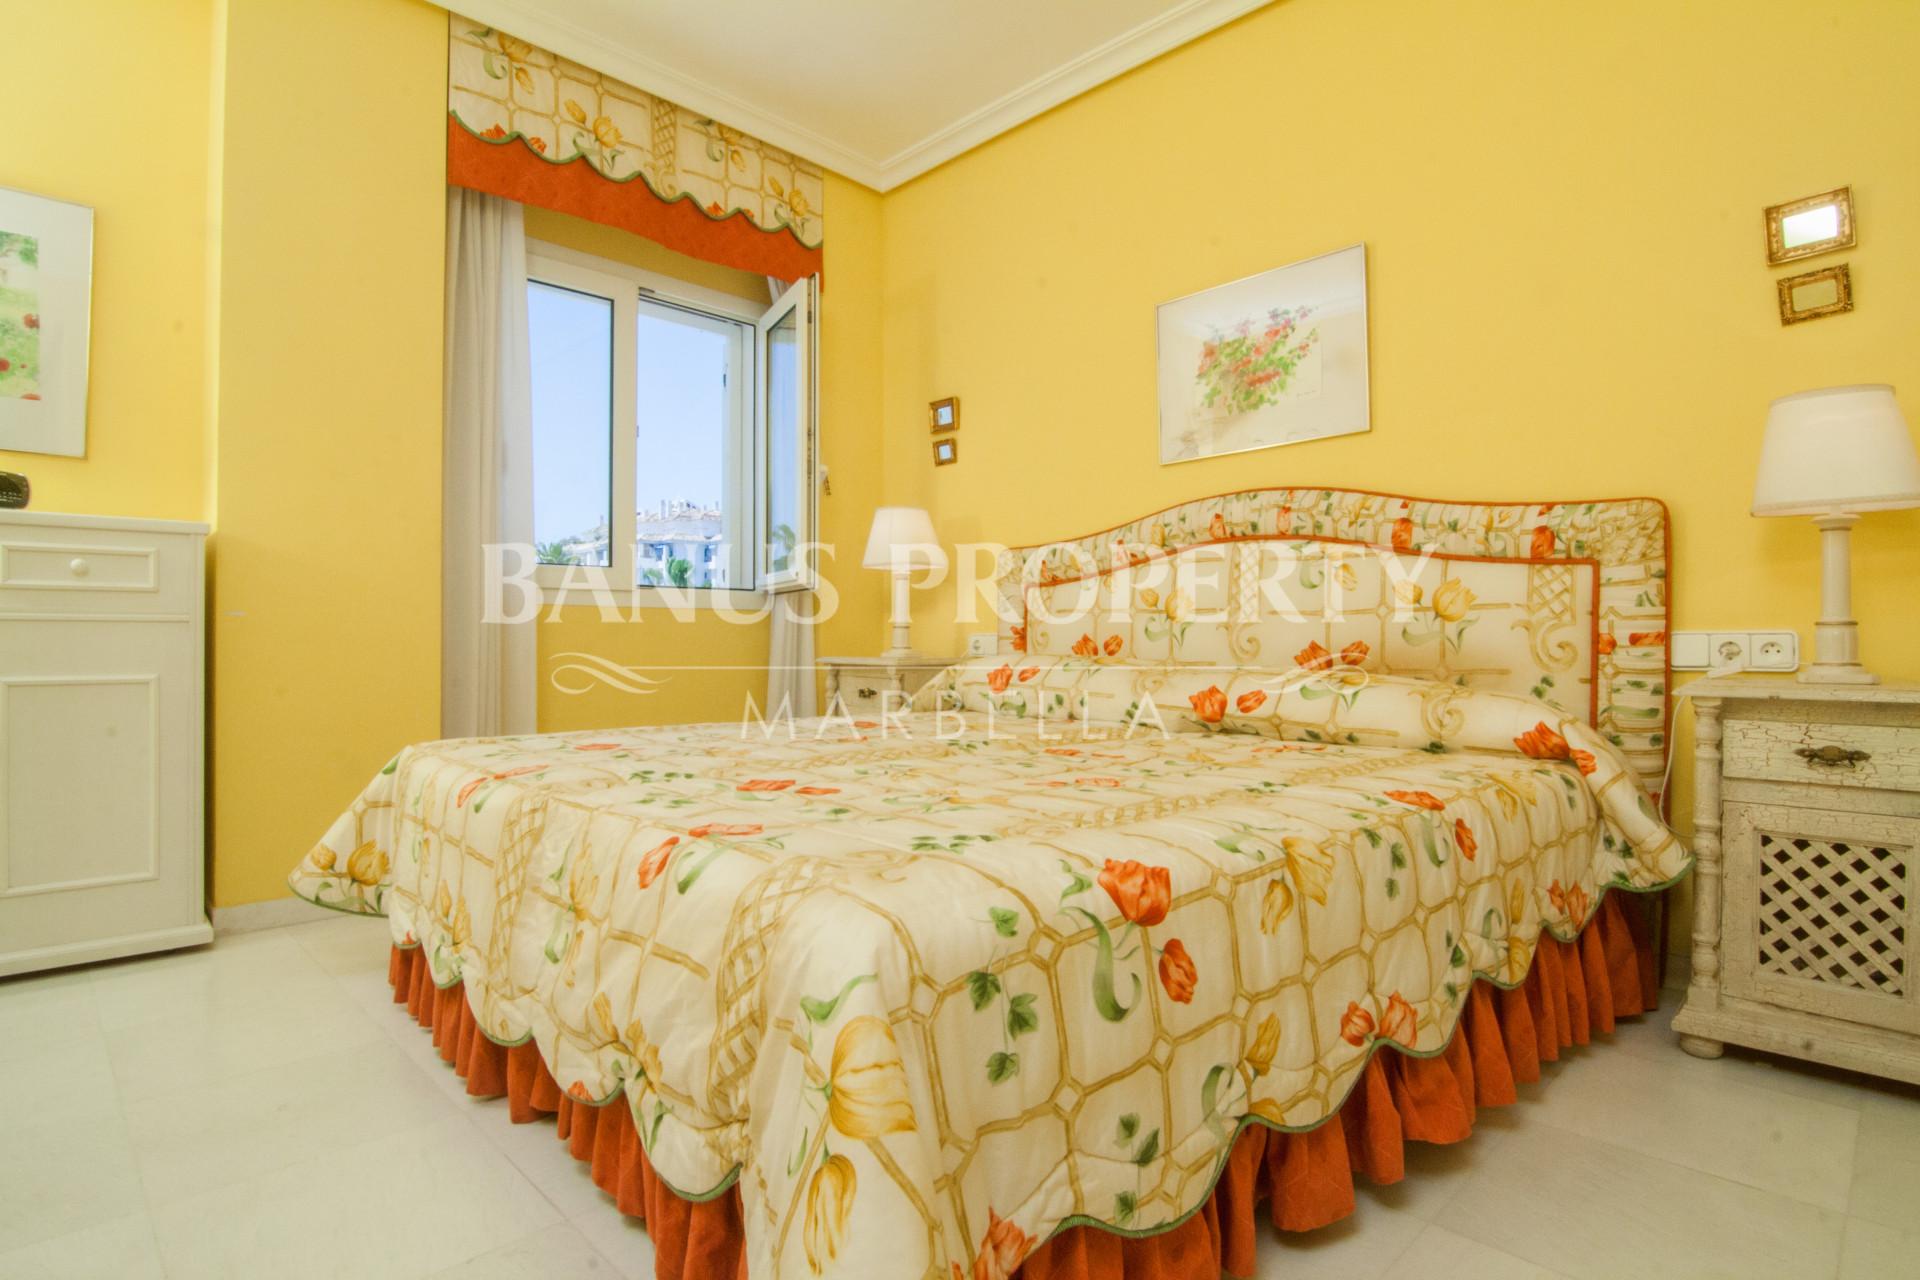 Two-bedroom first floor apartment for sale in Las Gaviotas, Puerto Banus